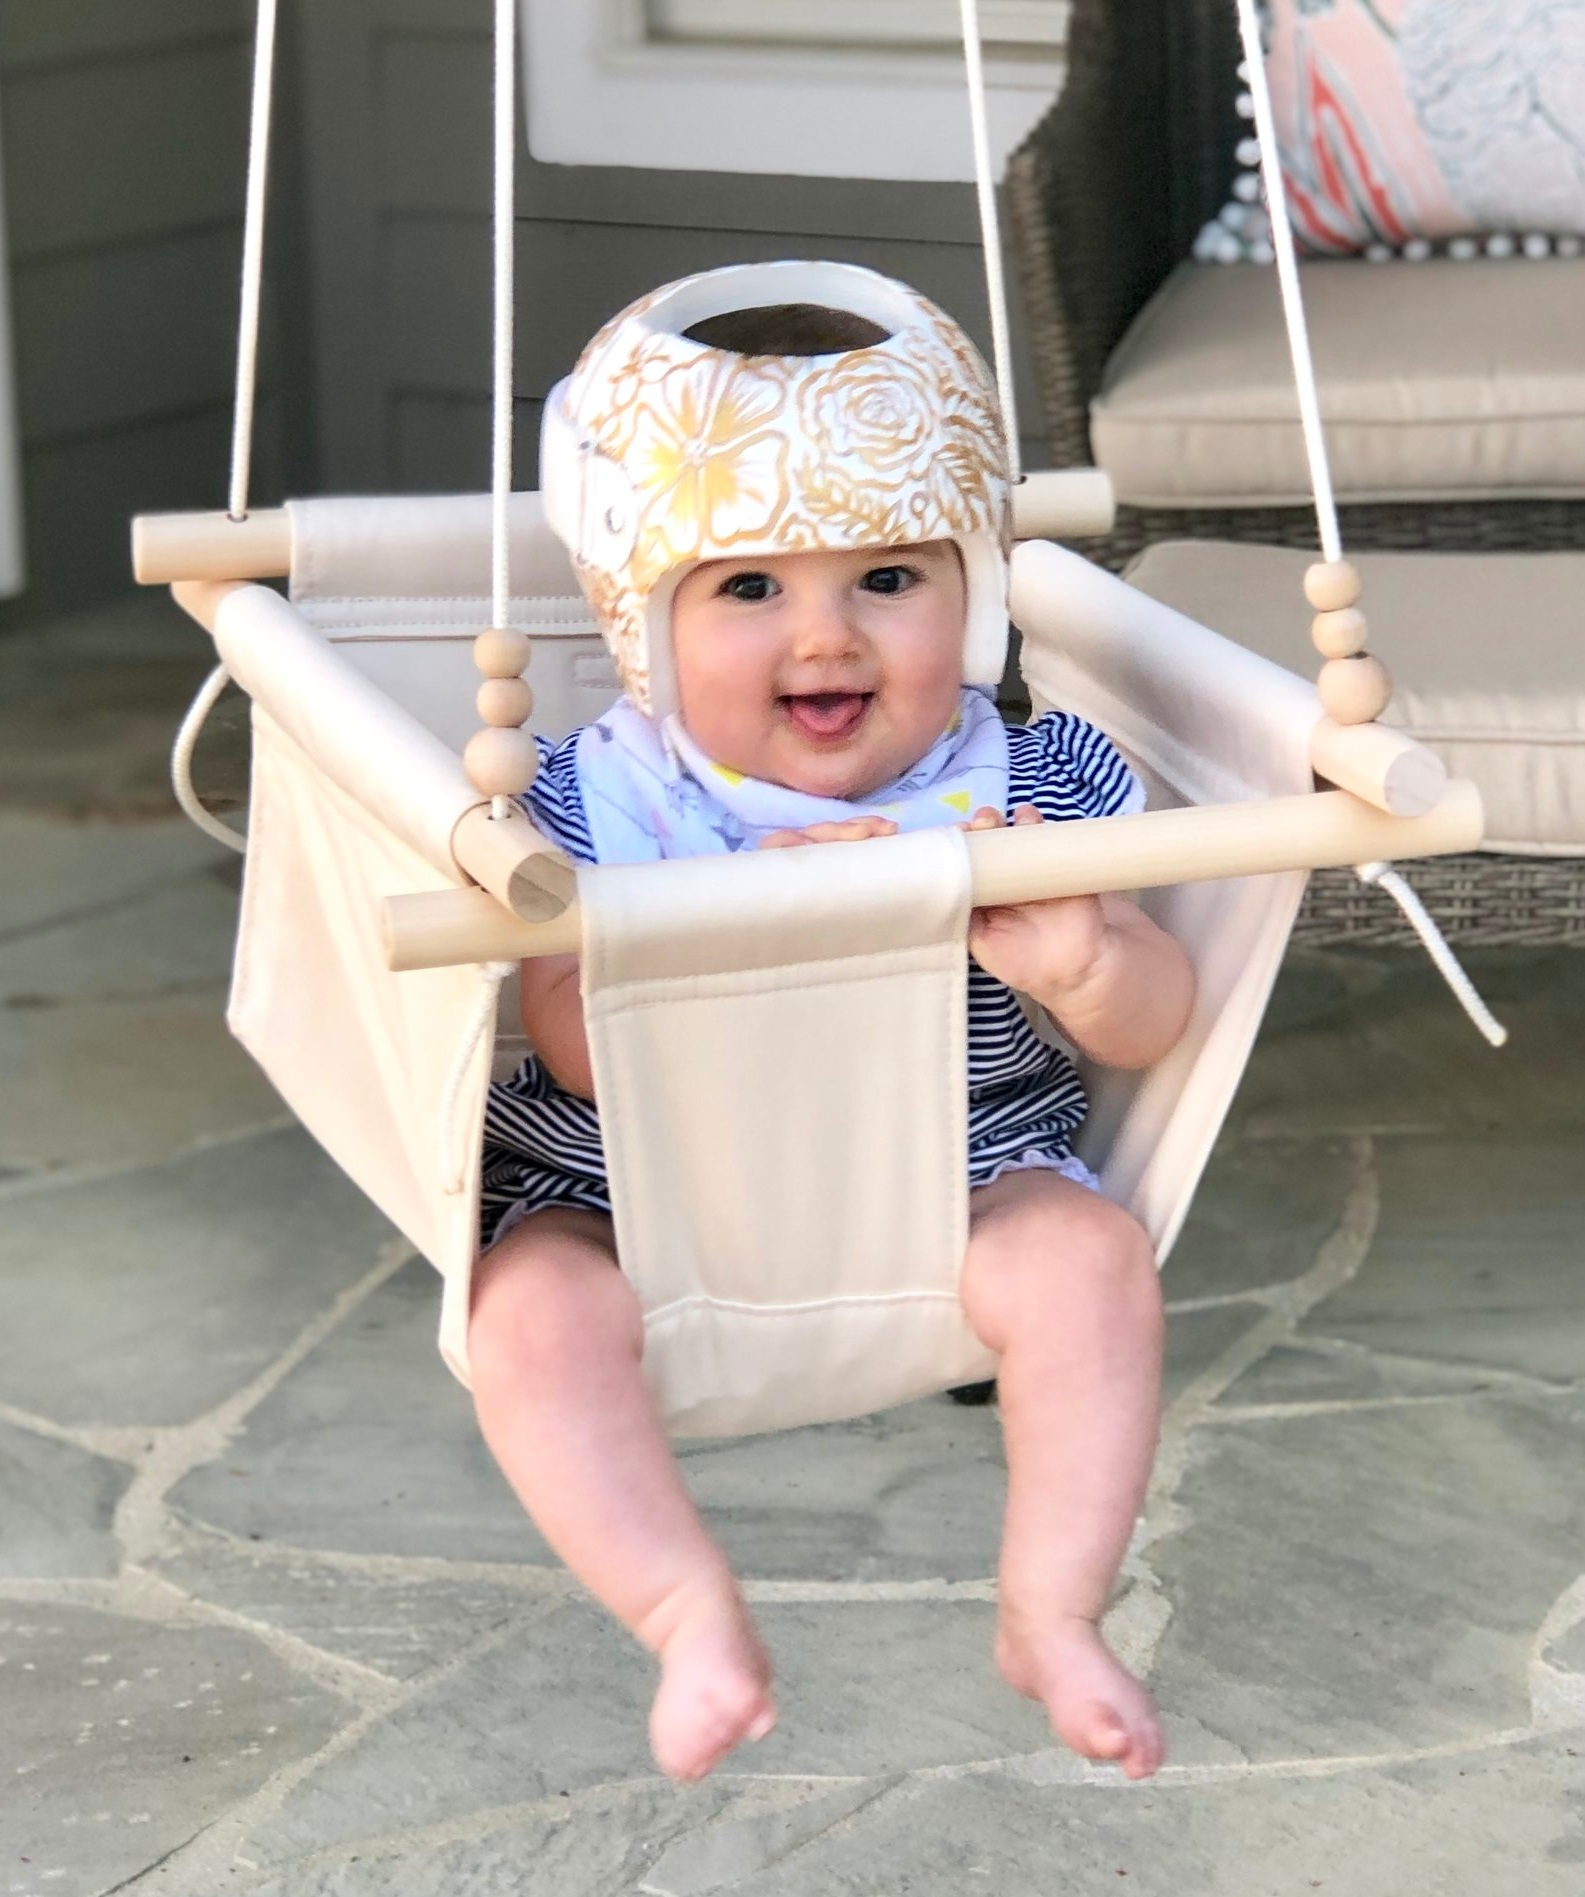 Orthomerica STARband cranial helmet